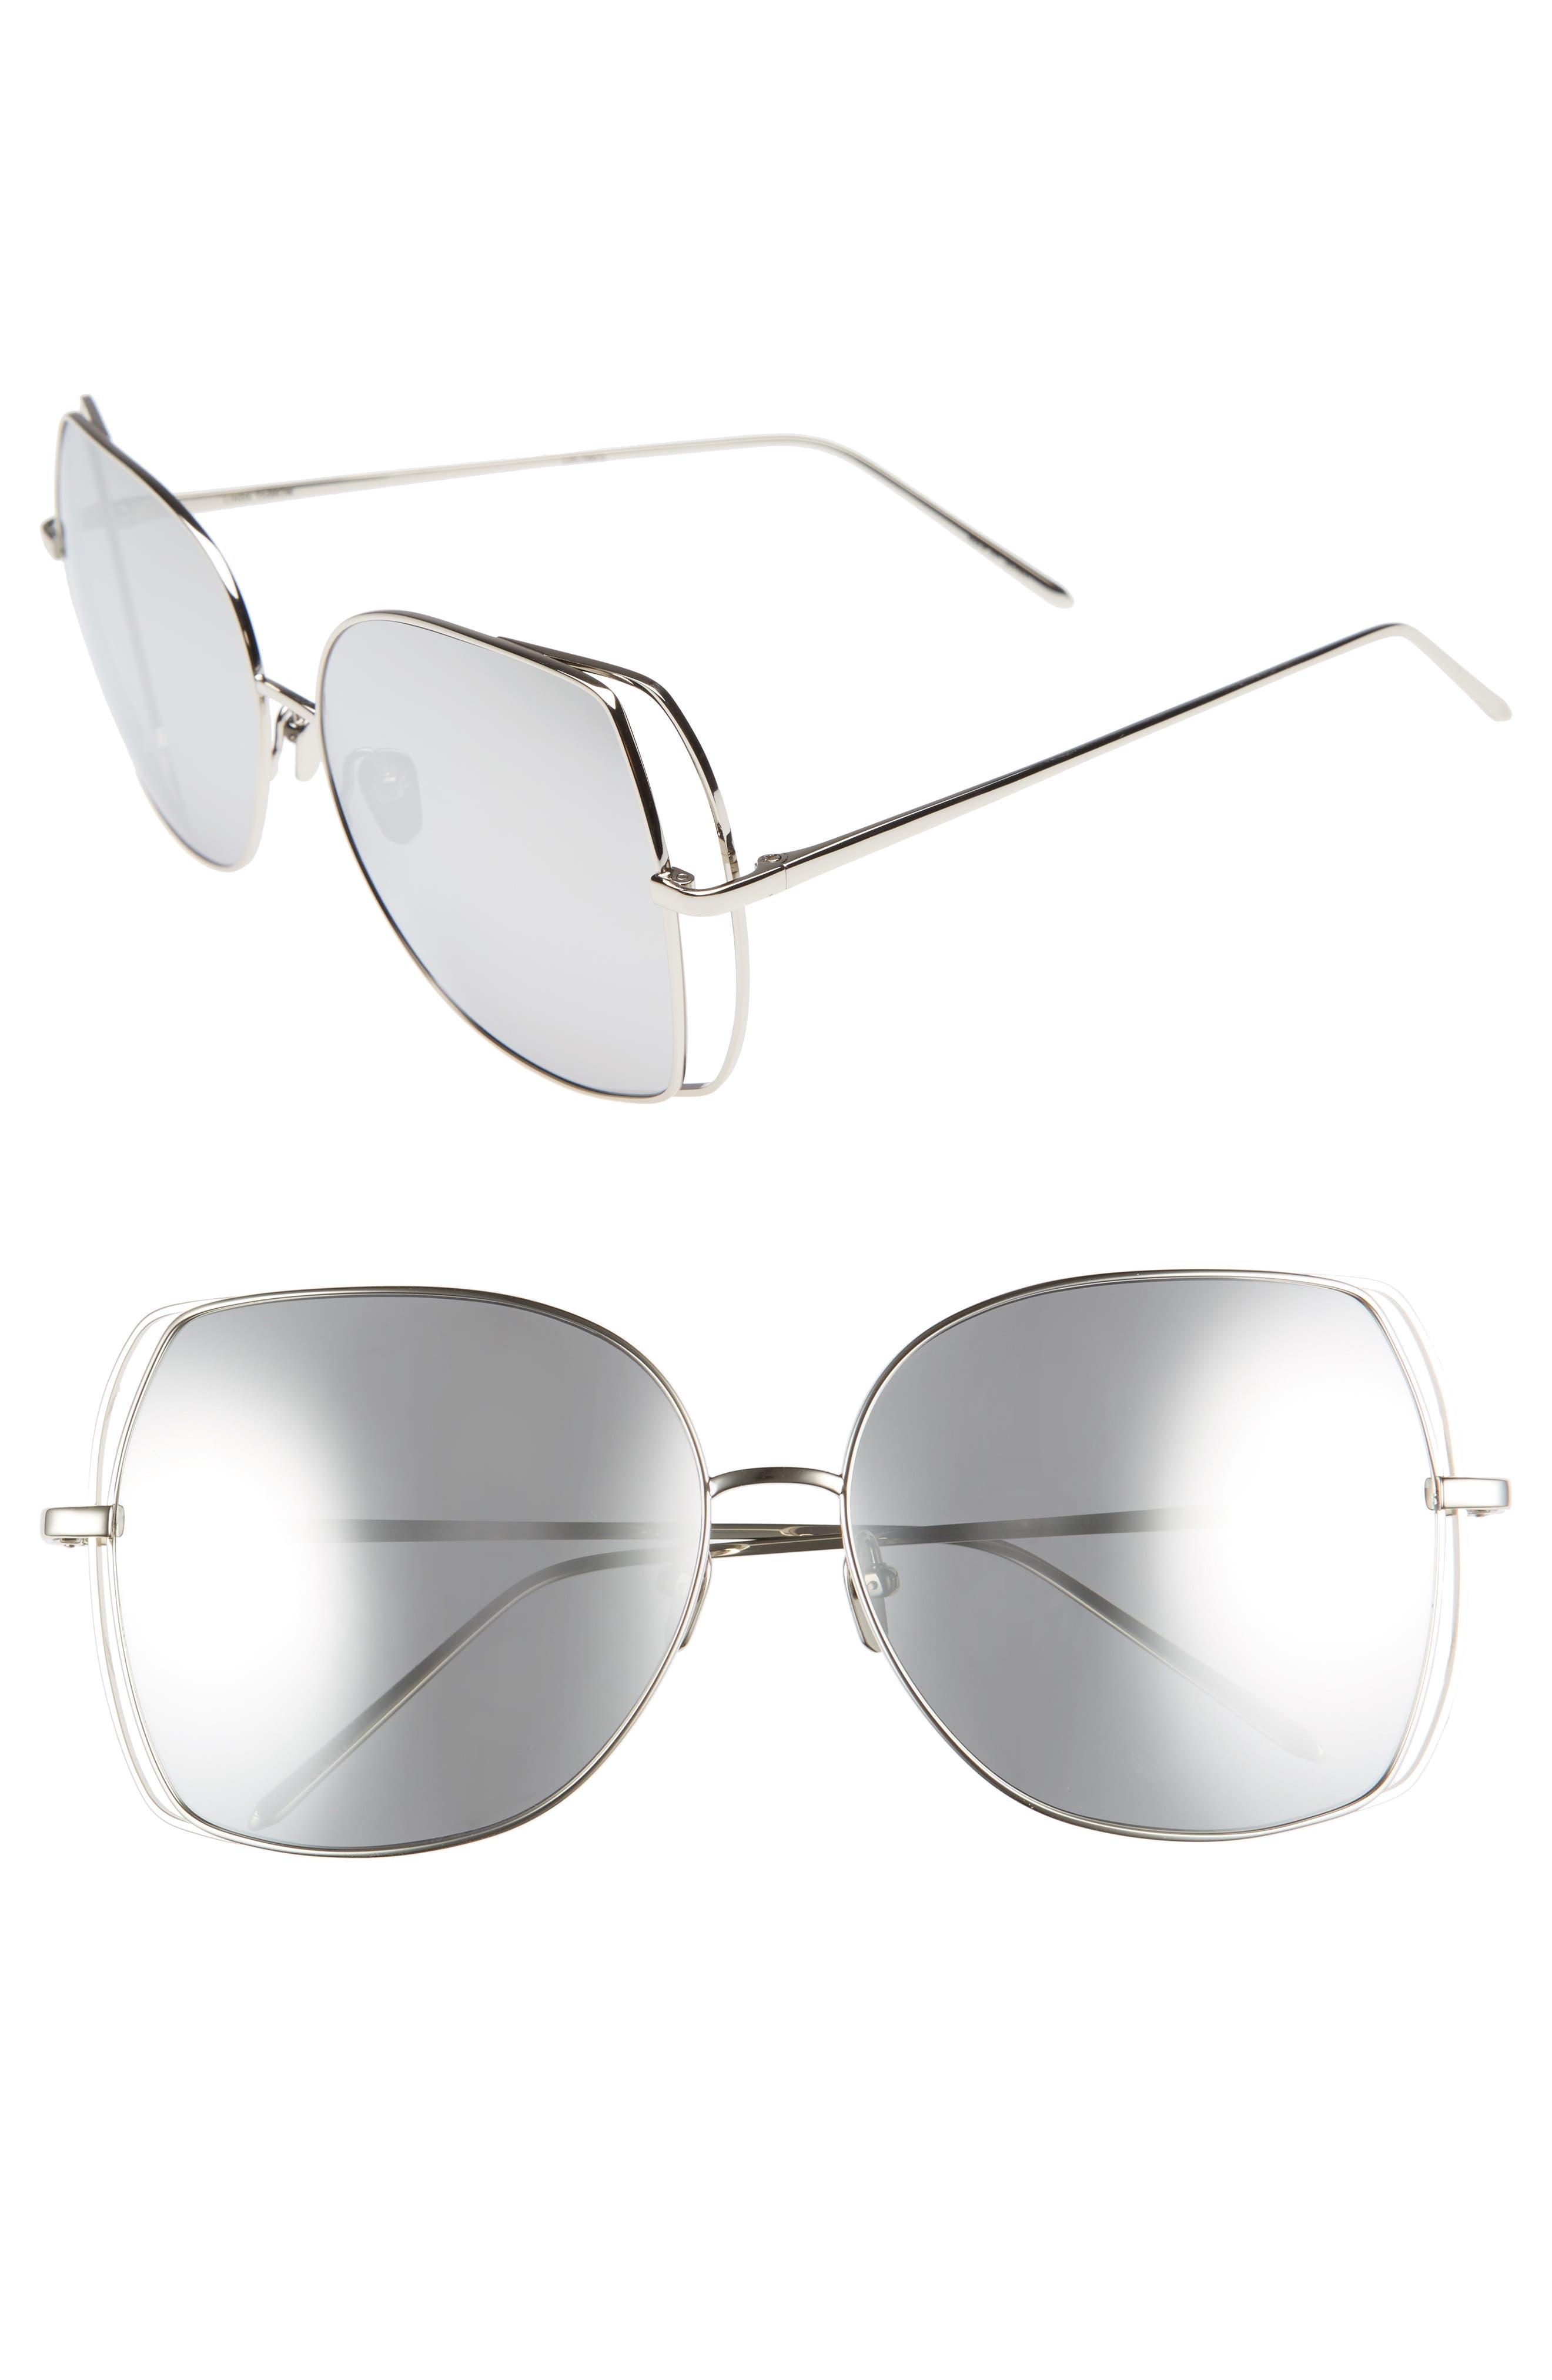 61mm Mirrored 18 Karat White Gold Sunglasses,                         Main,                         color,